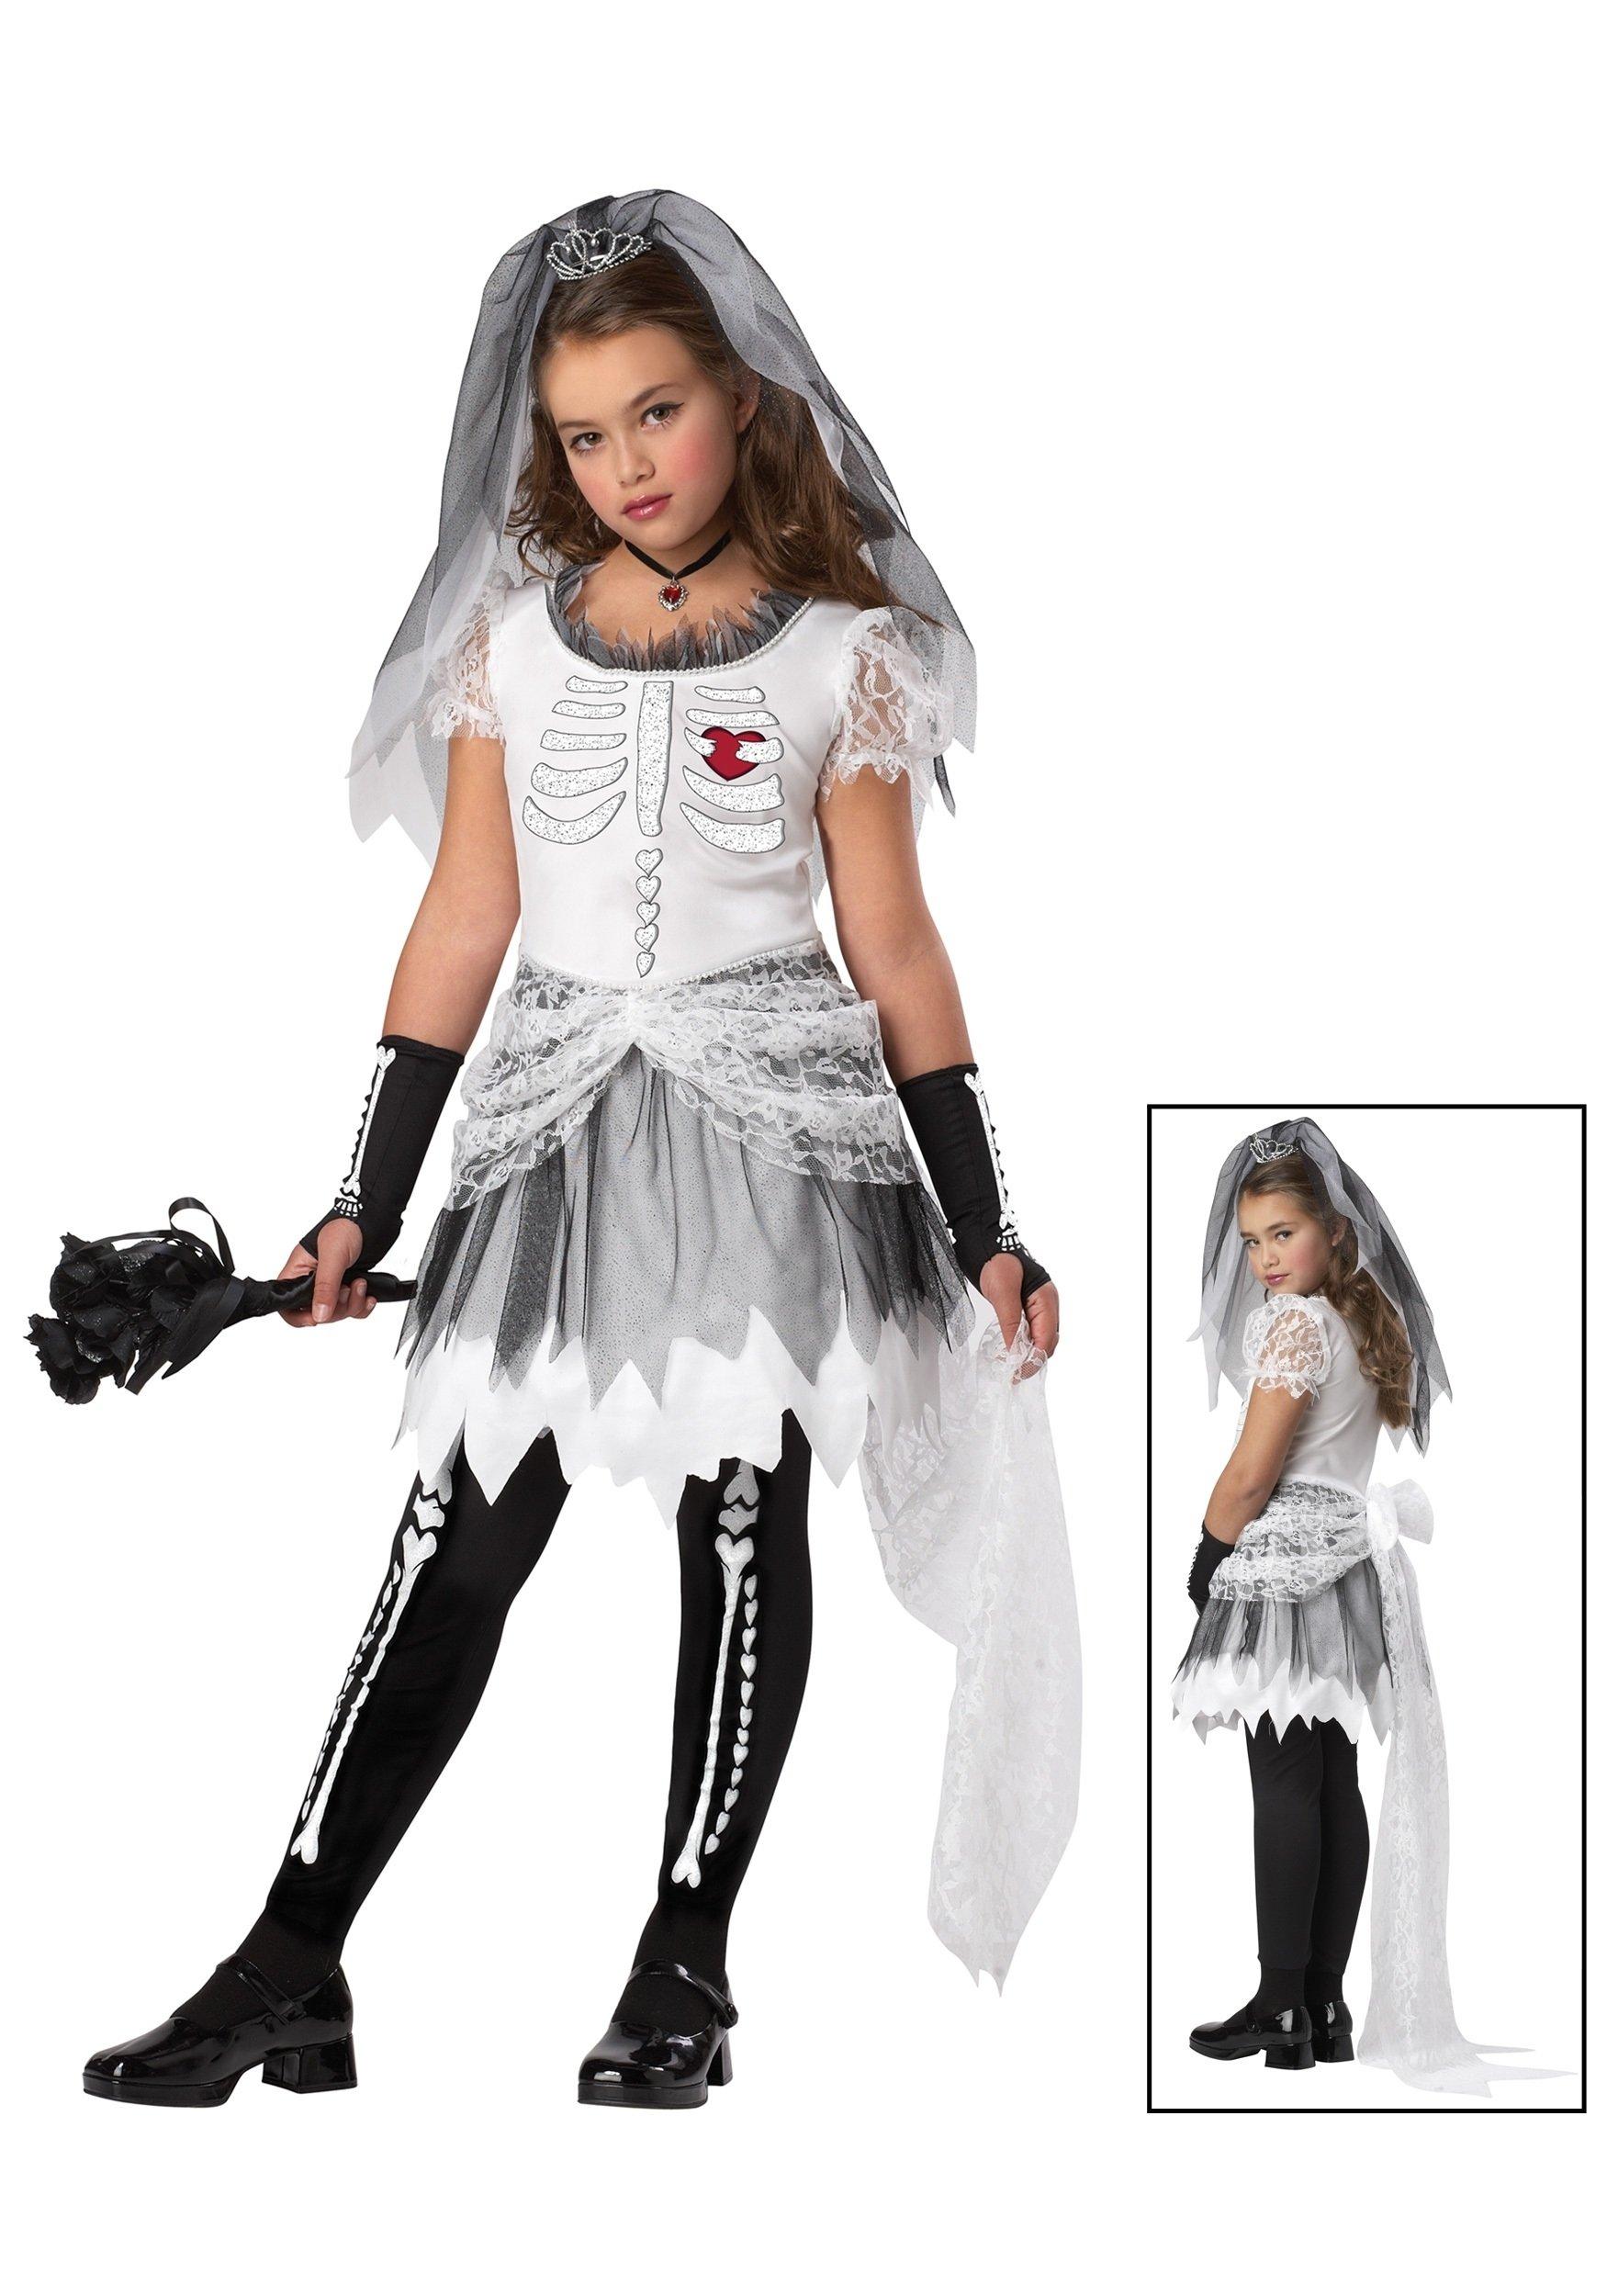 10 Fashionable Scary Costume Ideas For Girls girls skela bride costume halloween costume ideas 2016